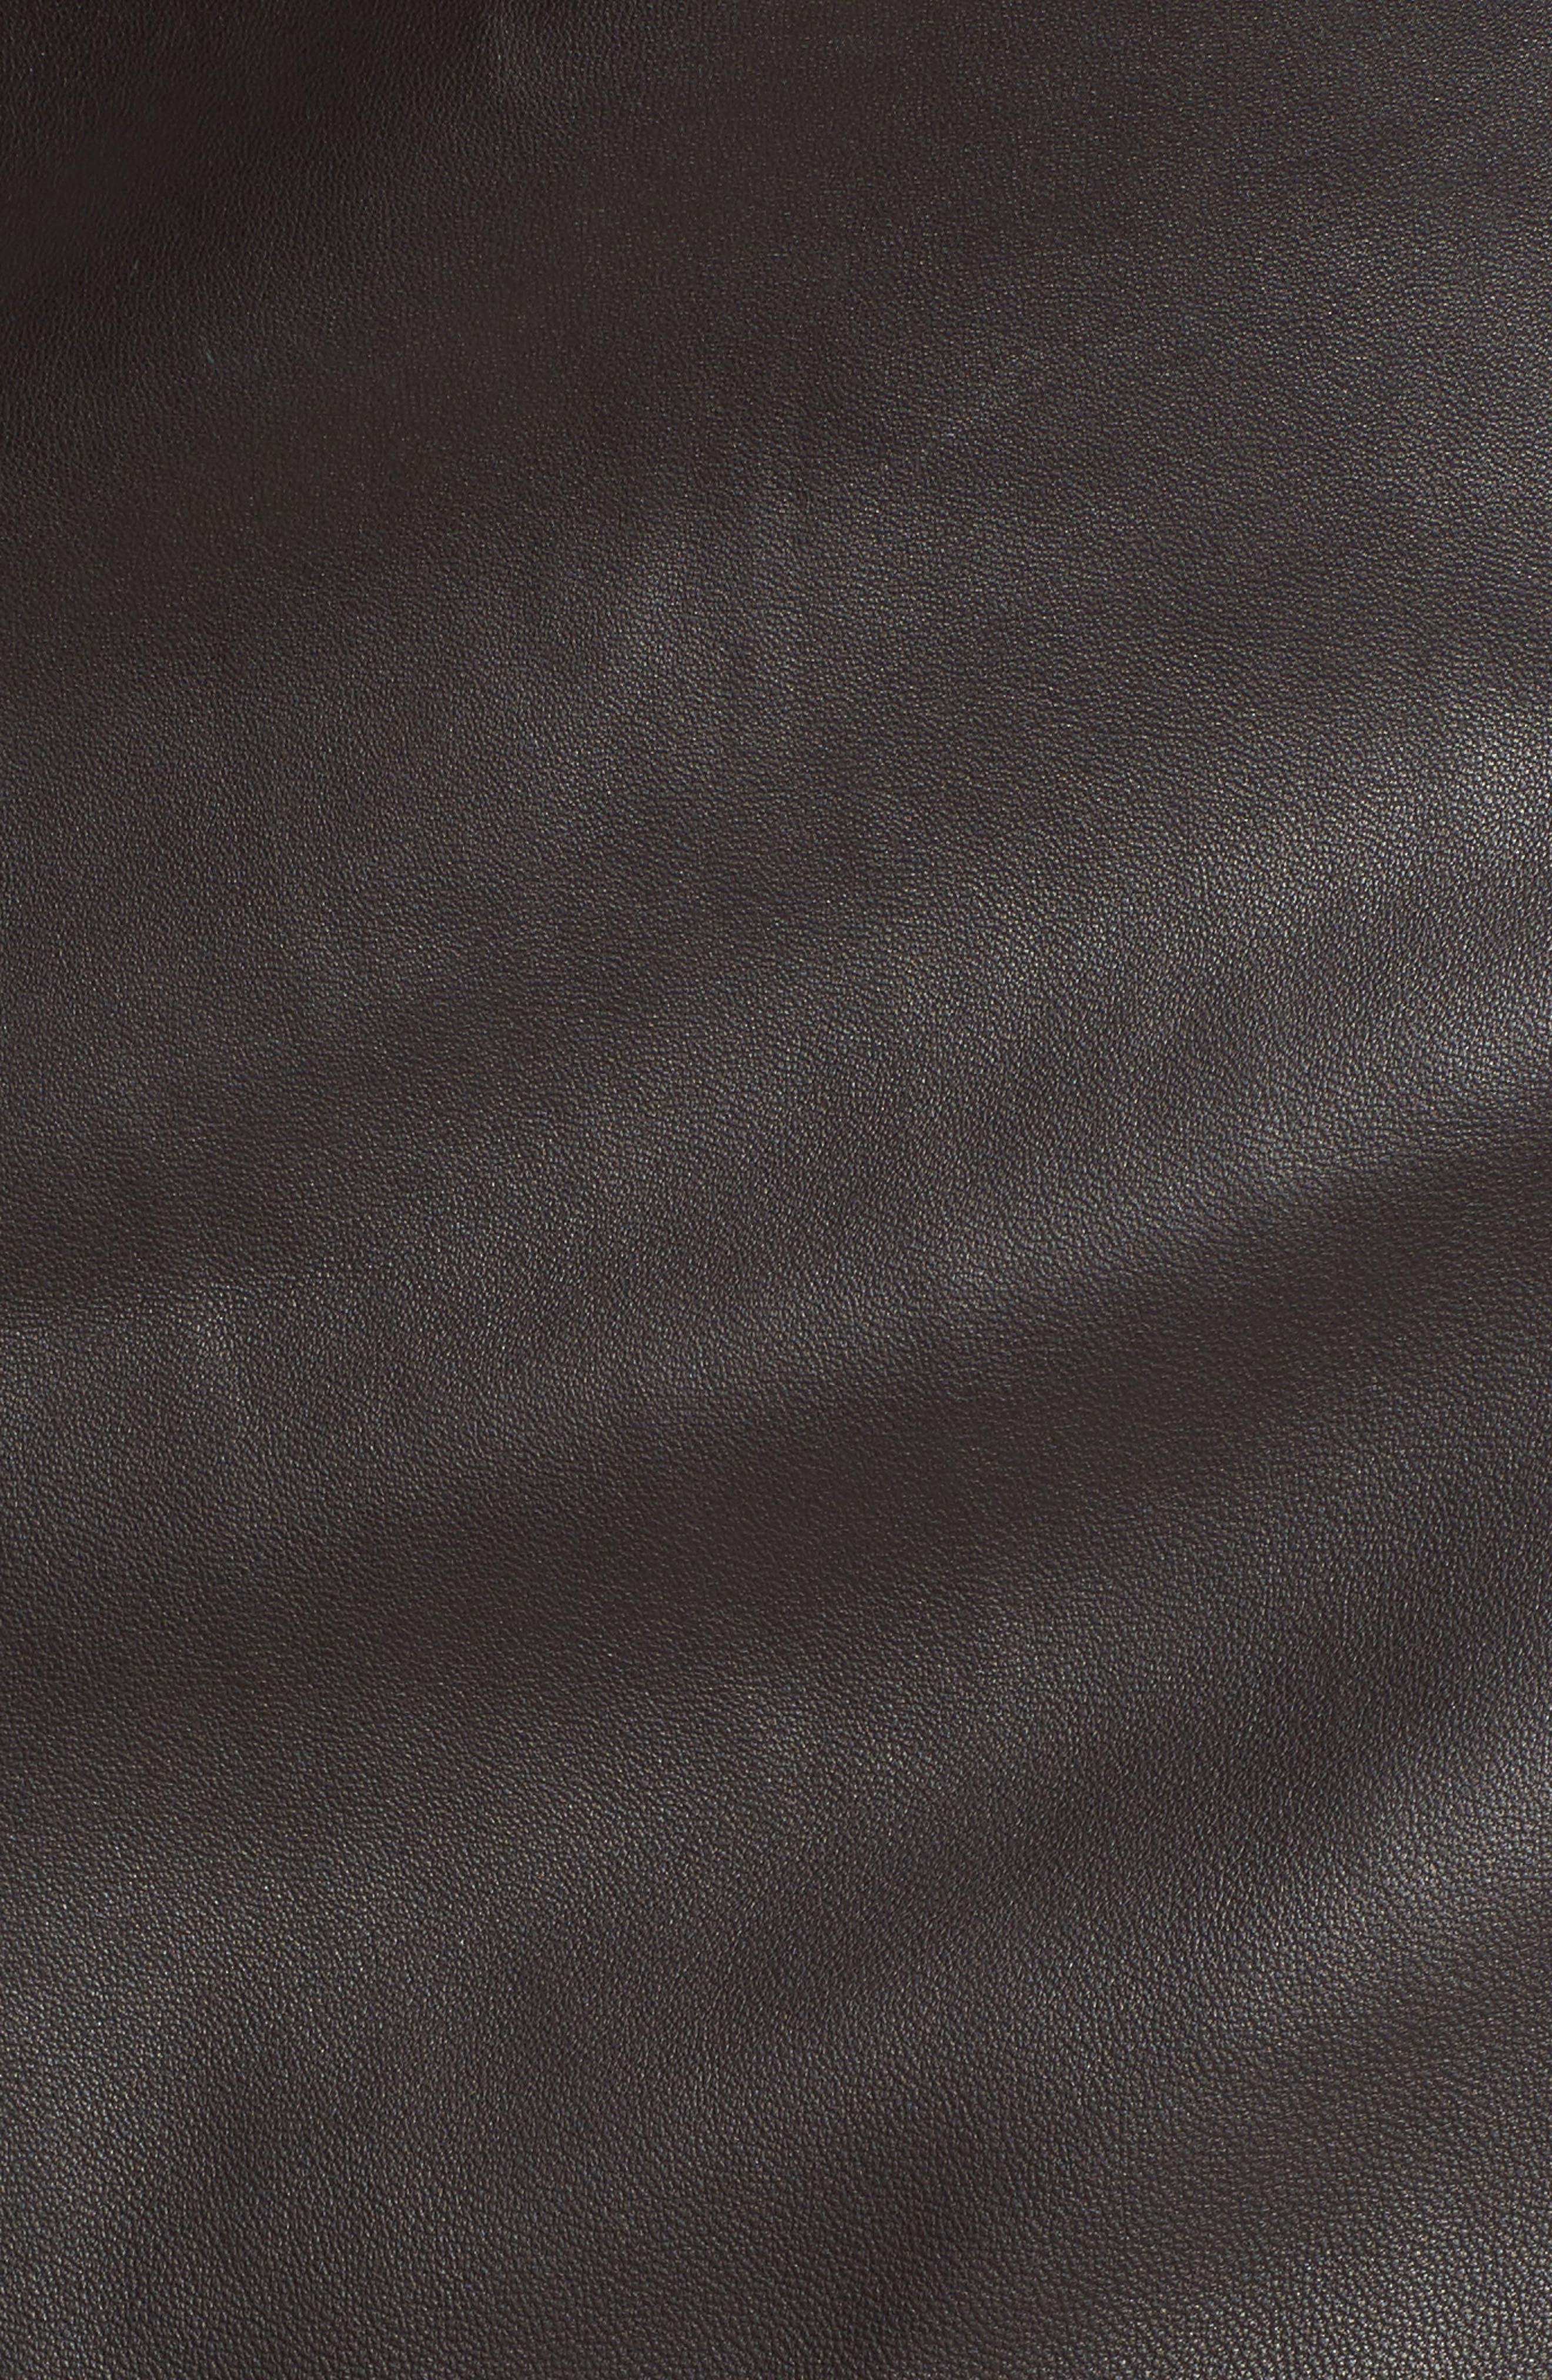 Sepama Leather Pencil Skirt,                             Alternate thumbnail 5, color,                             001